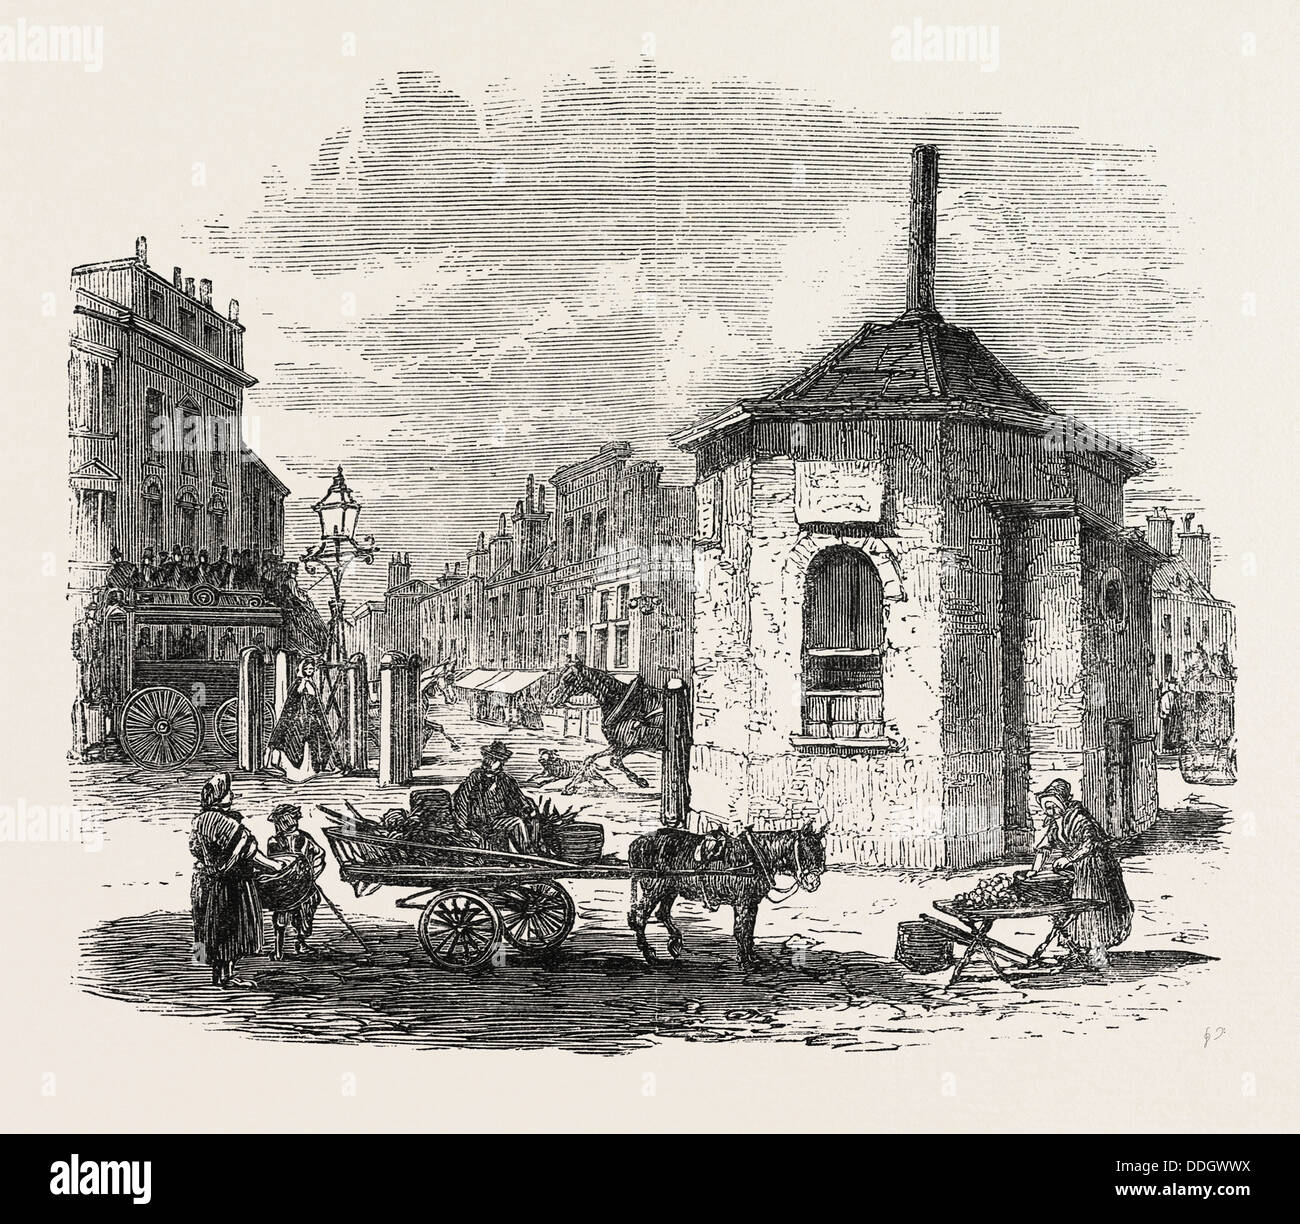 TURNPIKE GATES IN AND NEAR LONDON JUST DEMOLISHED: ISLINGTON GATE, UK, 1864 - Stock Image